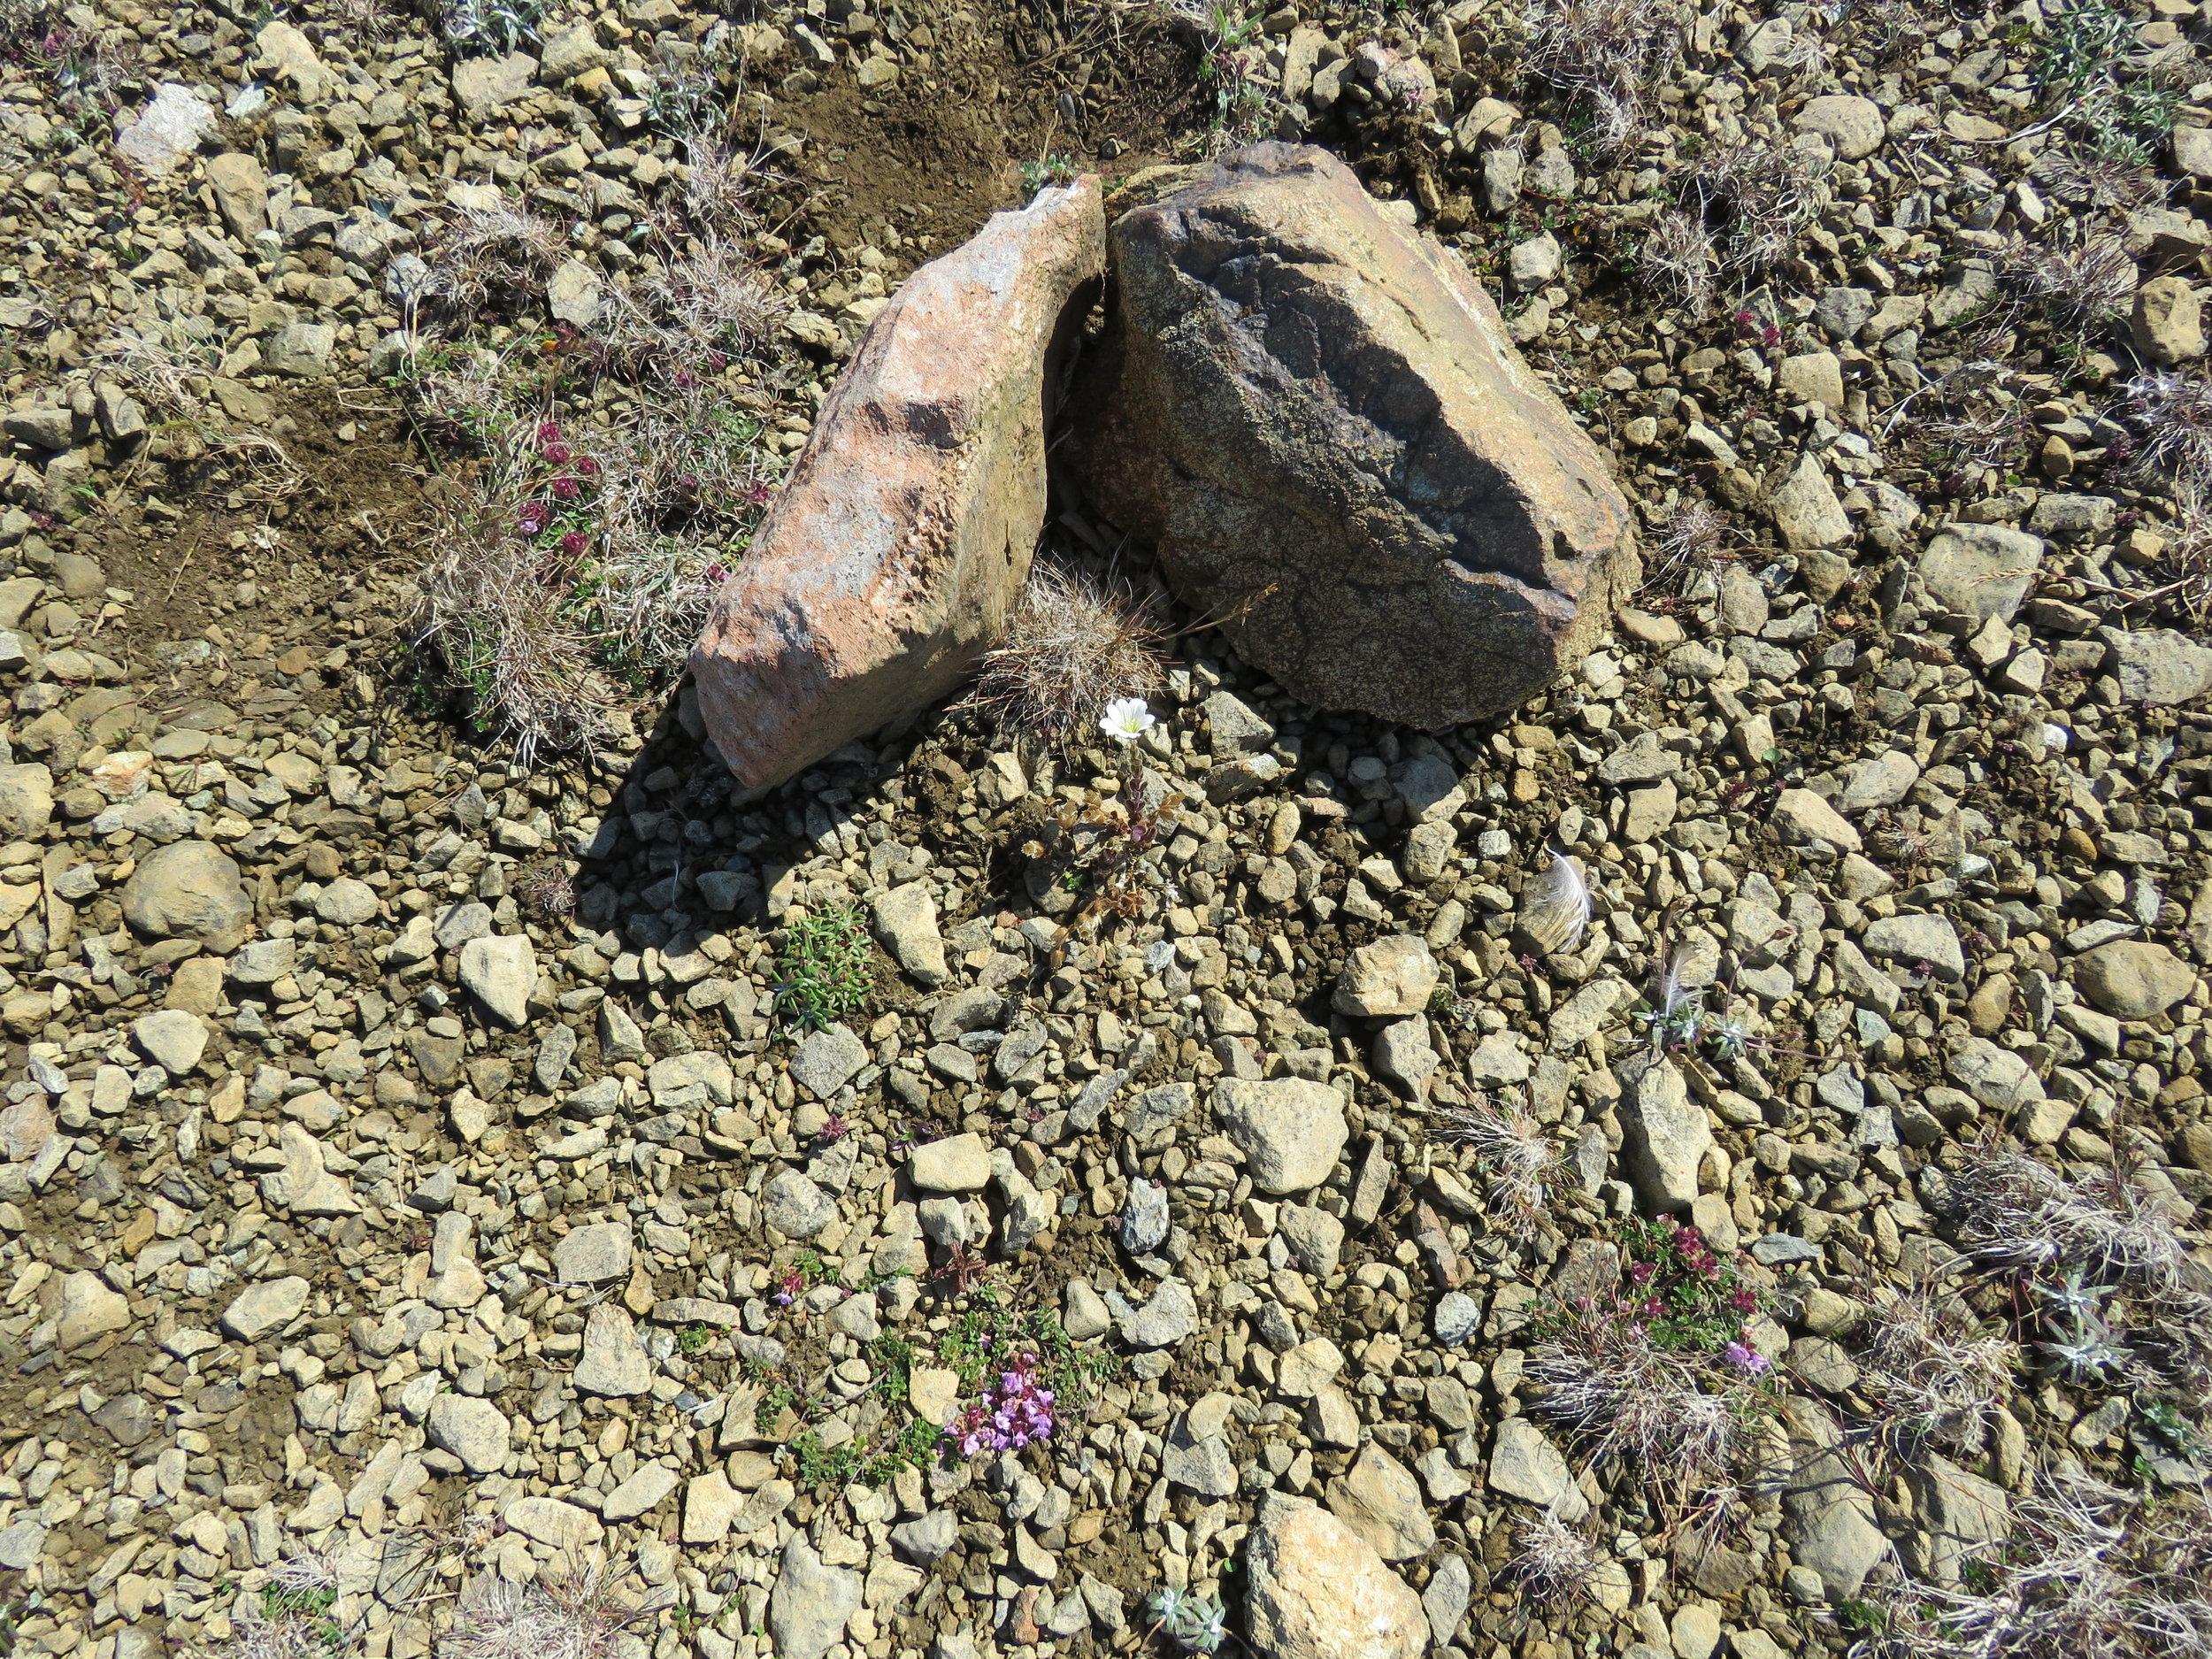 Den lille hvide blomst mellem de to sten er Shetland Mouse Ear.